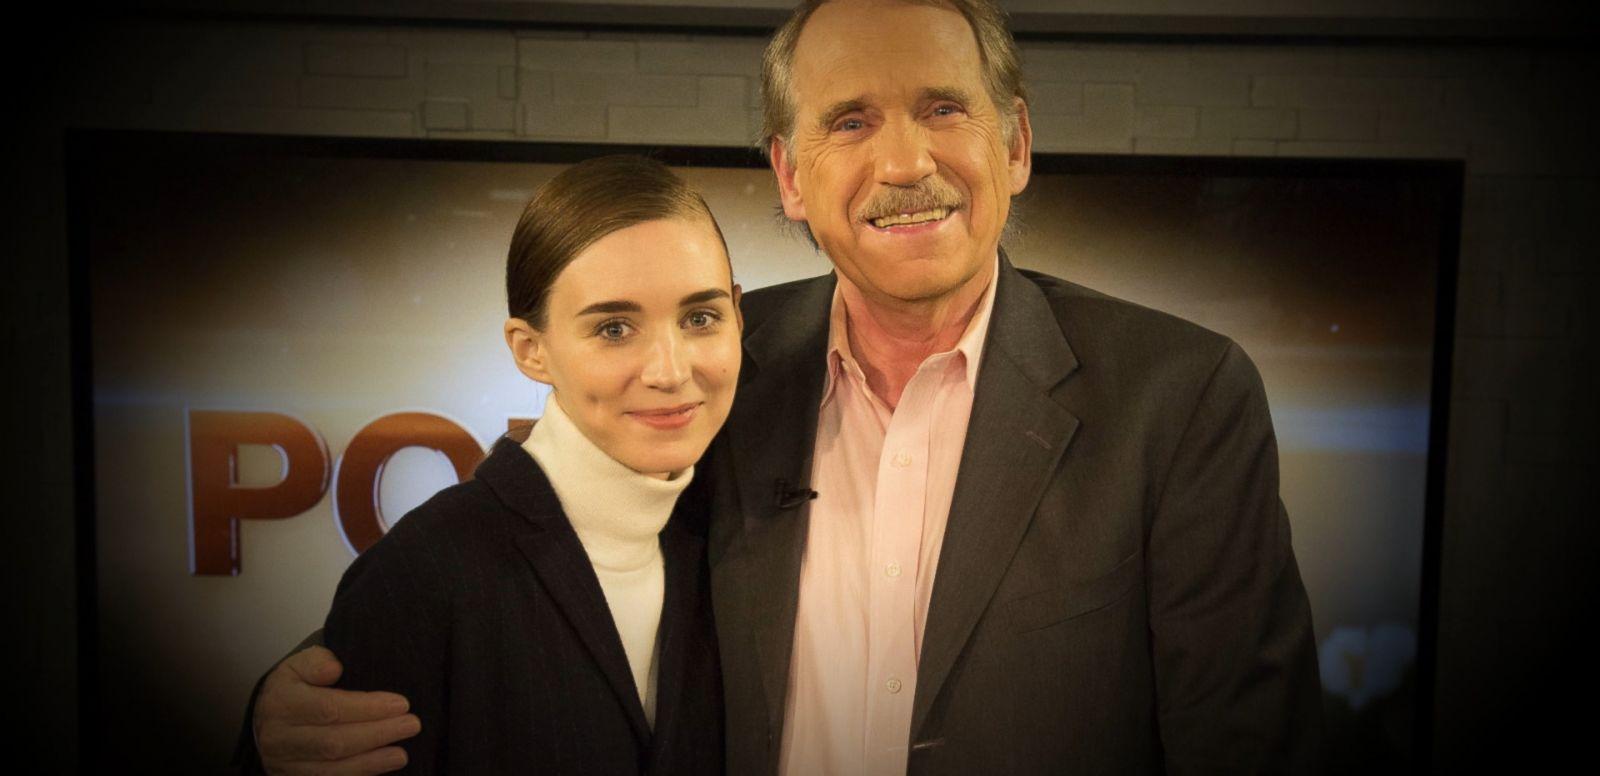 VIDEO: Oscar Nominee Rooney Mara Talks Cate Blachett and her role in 'Carol'